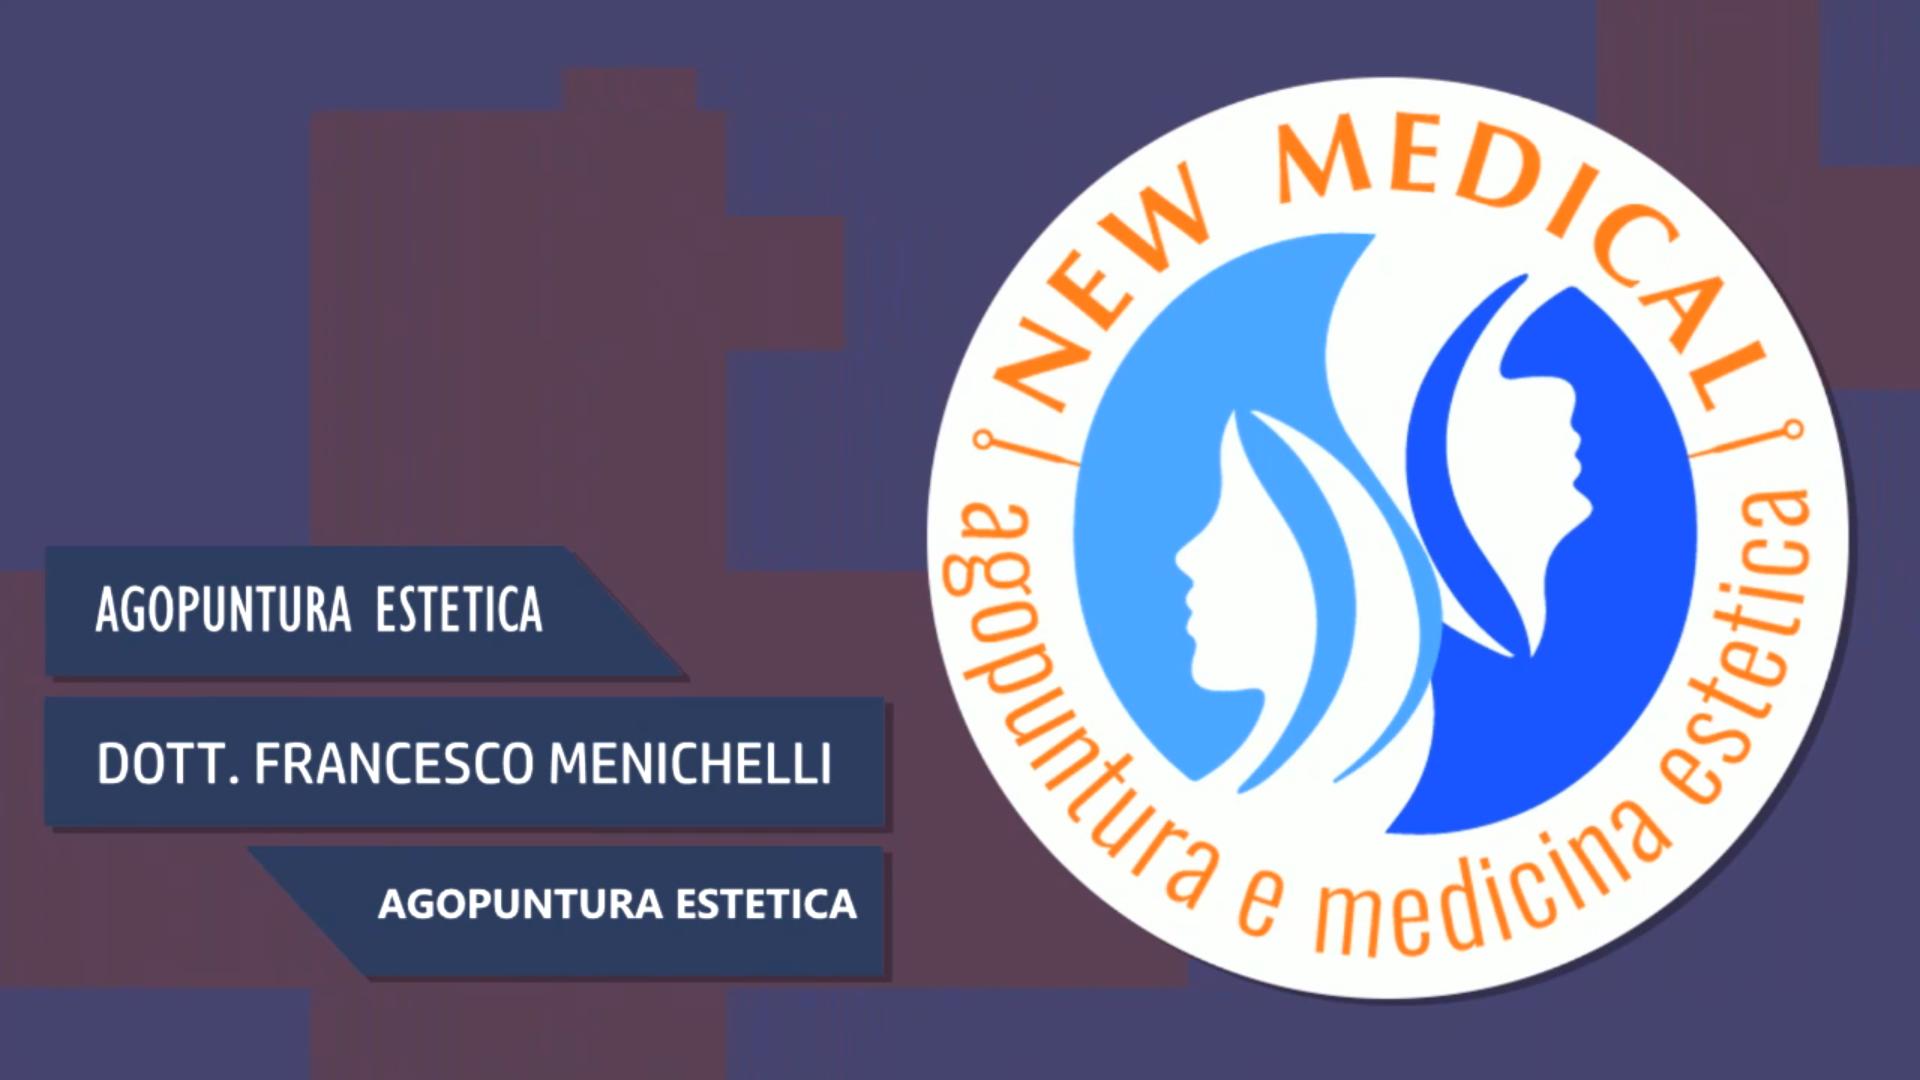 Intervista al Dott. Francesco Menichelli – Agopuntura estetica